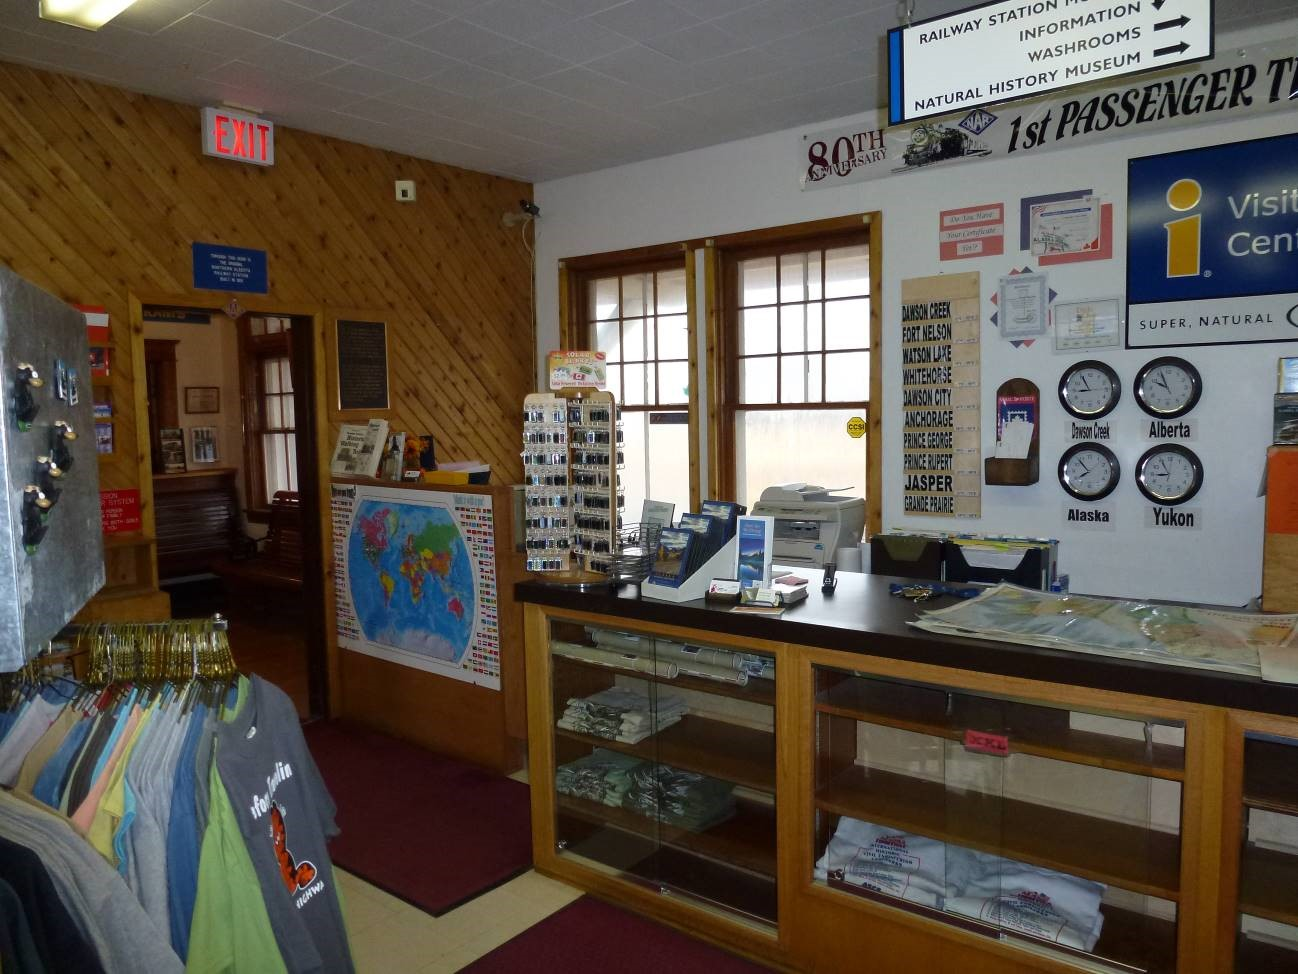 Inside NAR Station